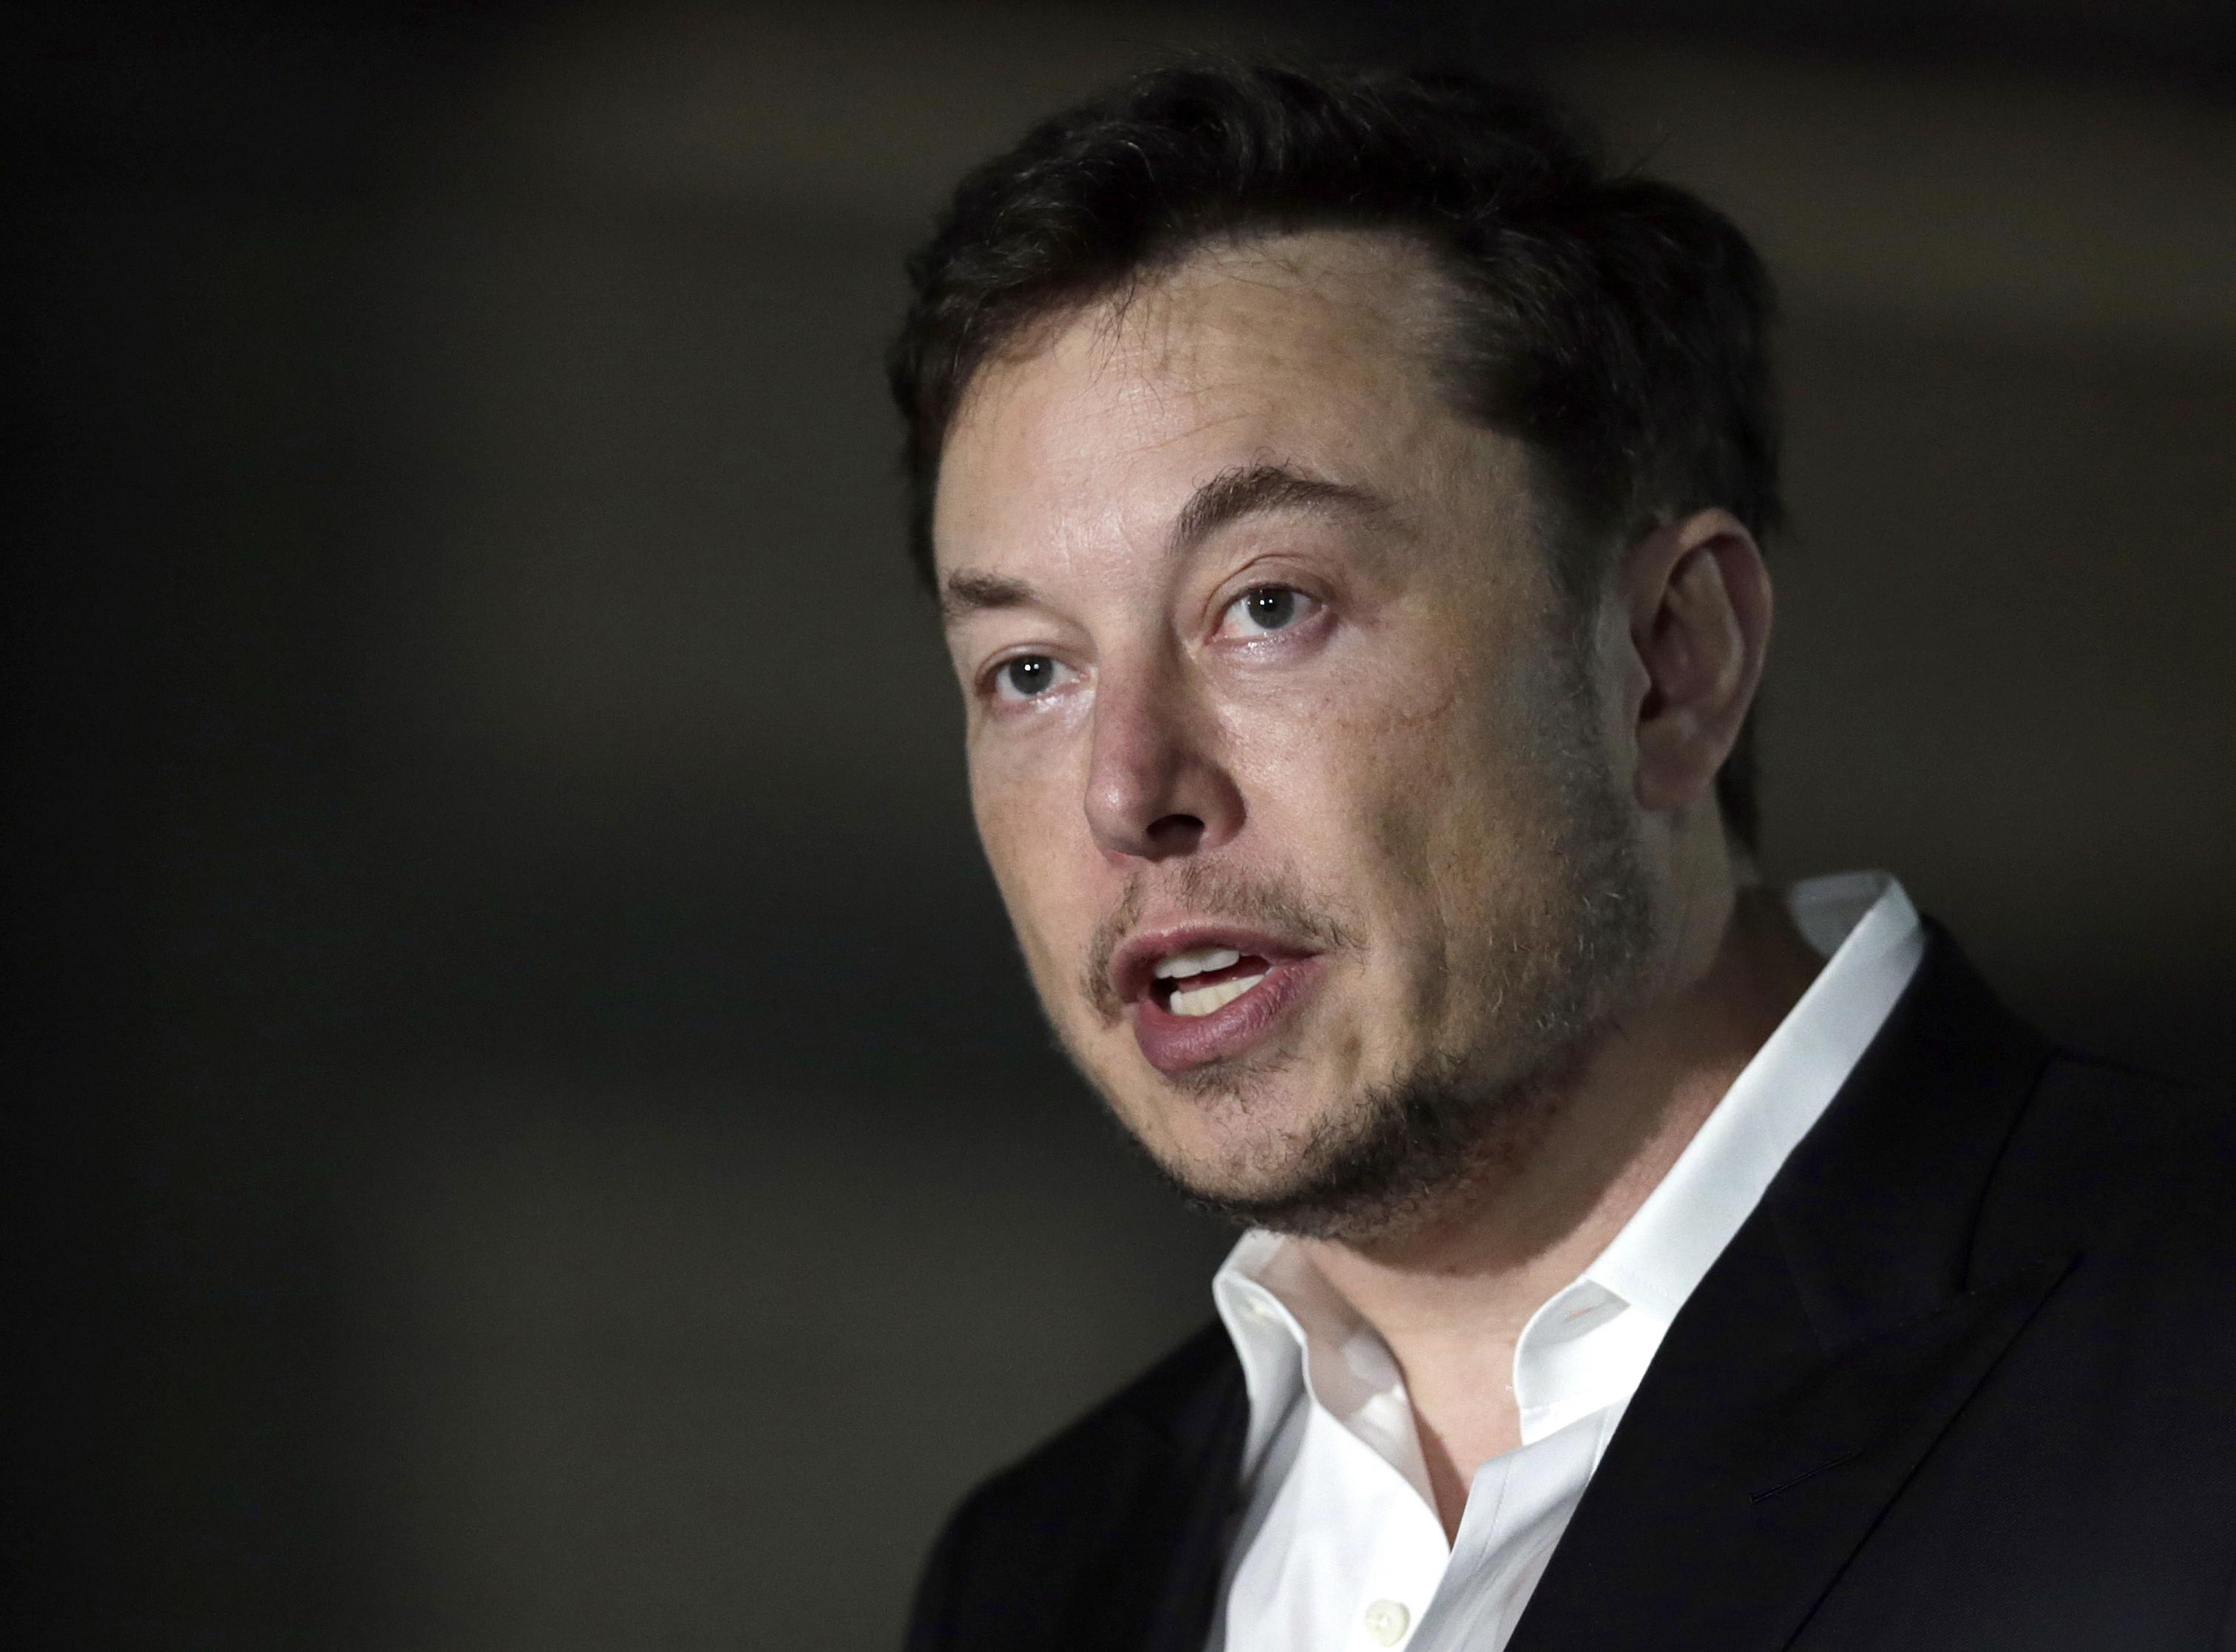 washingtonpost.com - Christine Emba - We're finally getting sick of the Elon Musks of the world